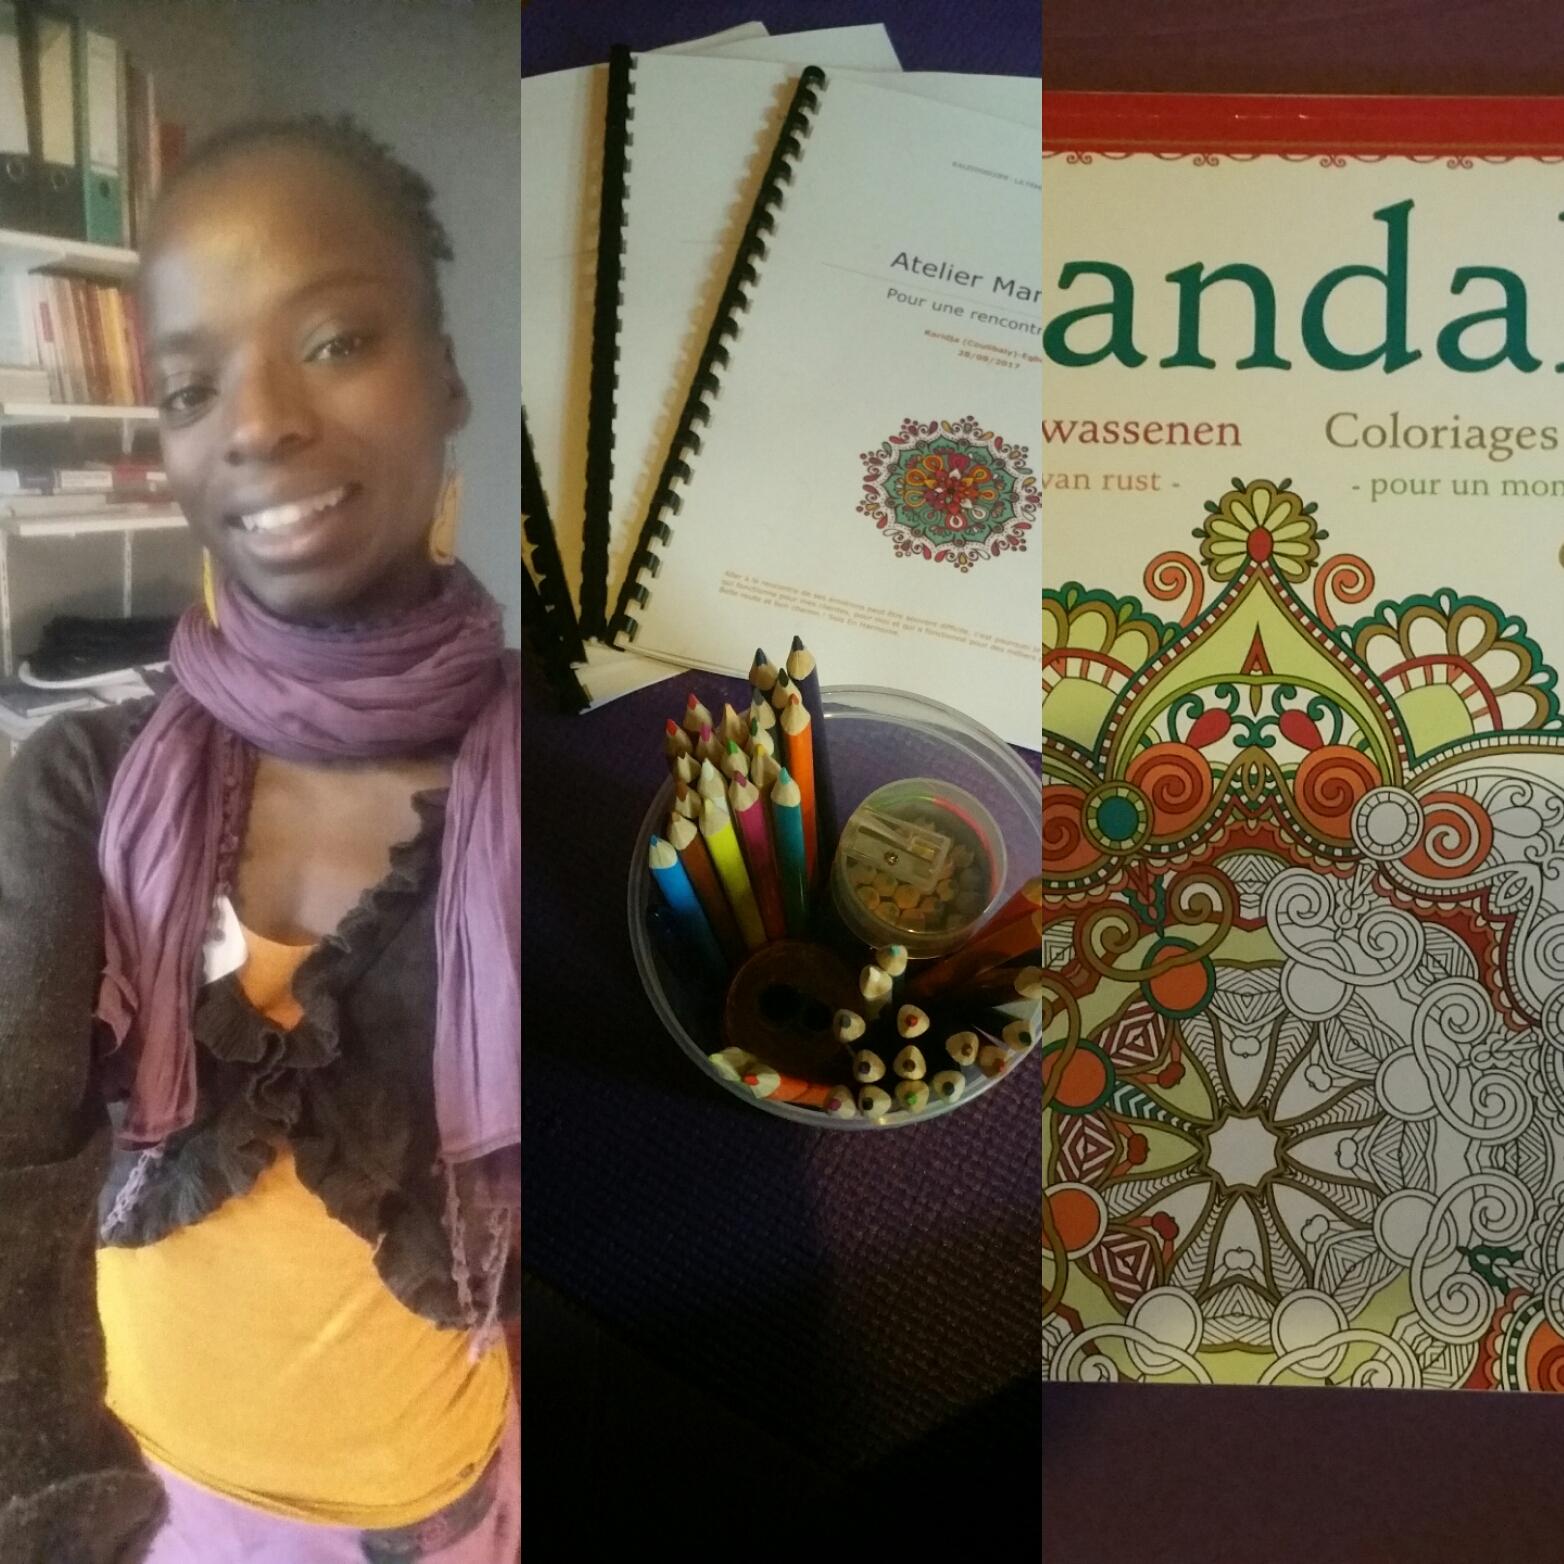 Karidja I Atelier Mandalas I Blégny